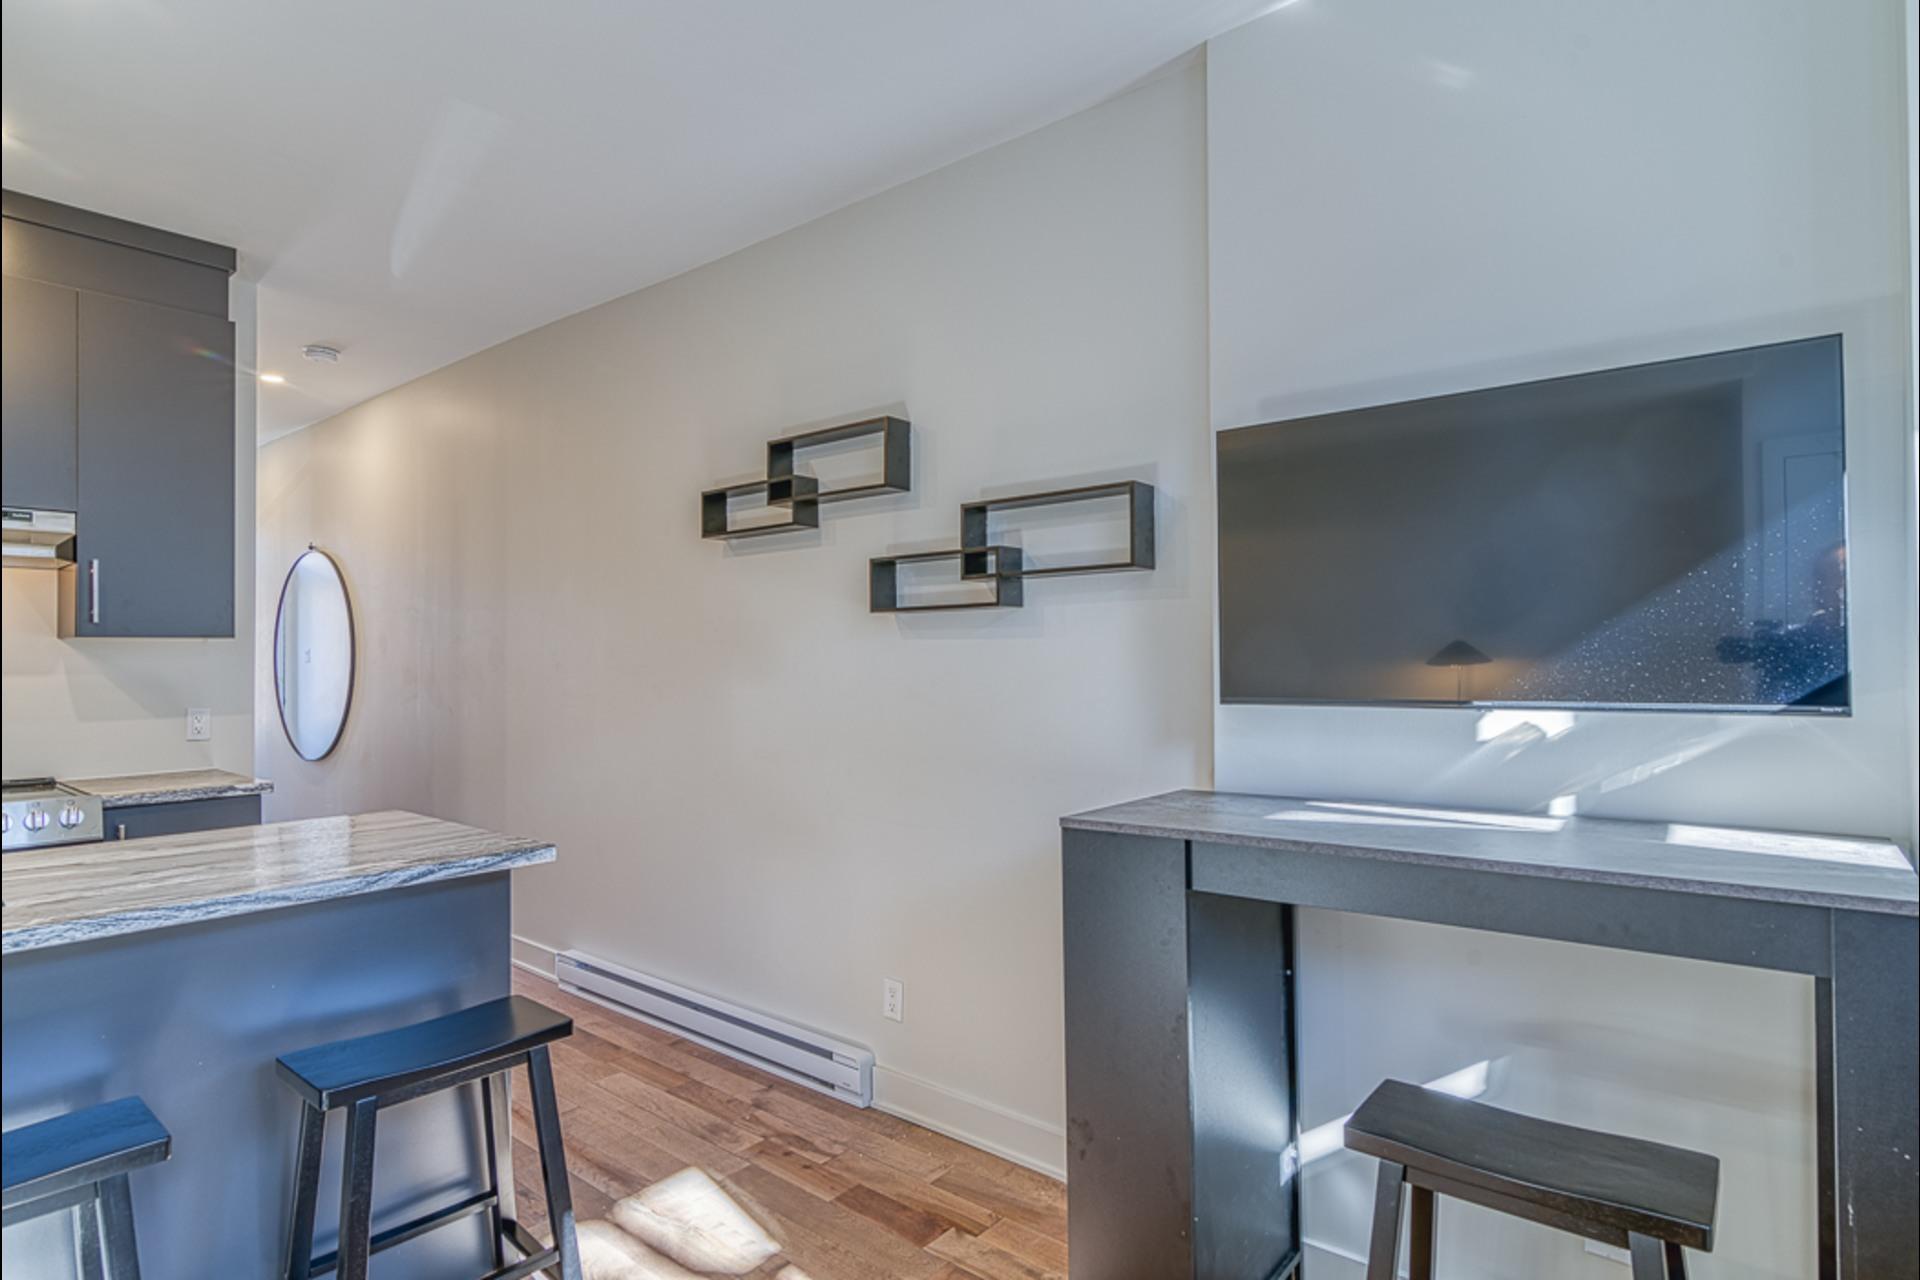 image 19 - Furnished Appartement For rent Montréal - 3 rooms